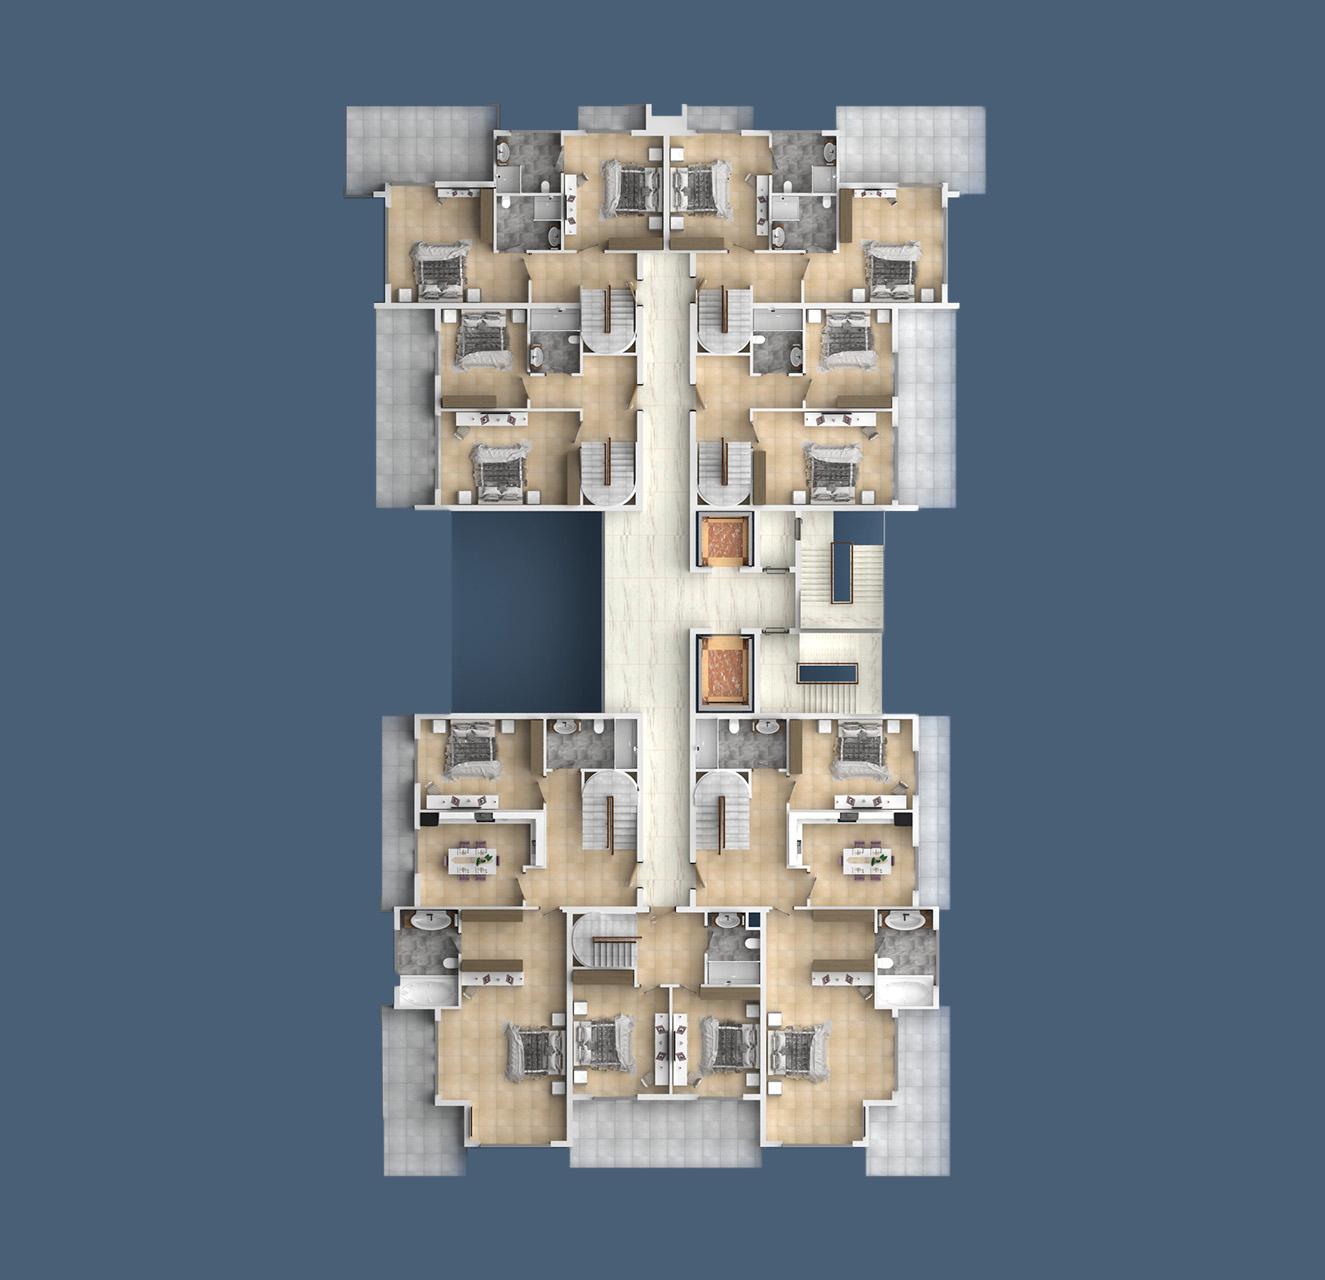 План расположения квартир 7 этаж A Yekta Kingdom Trade Center